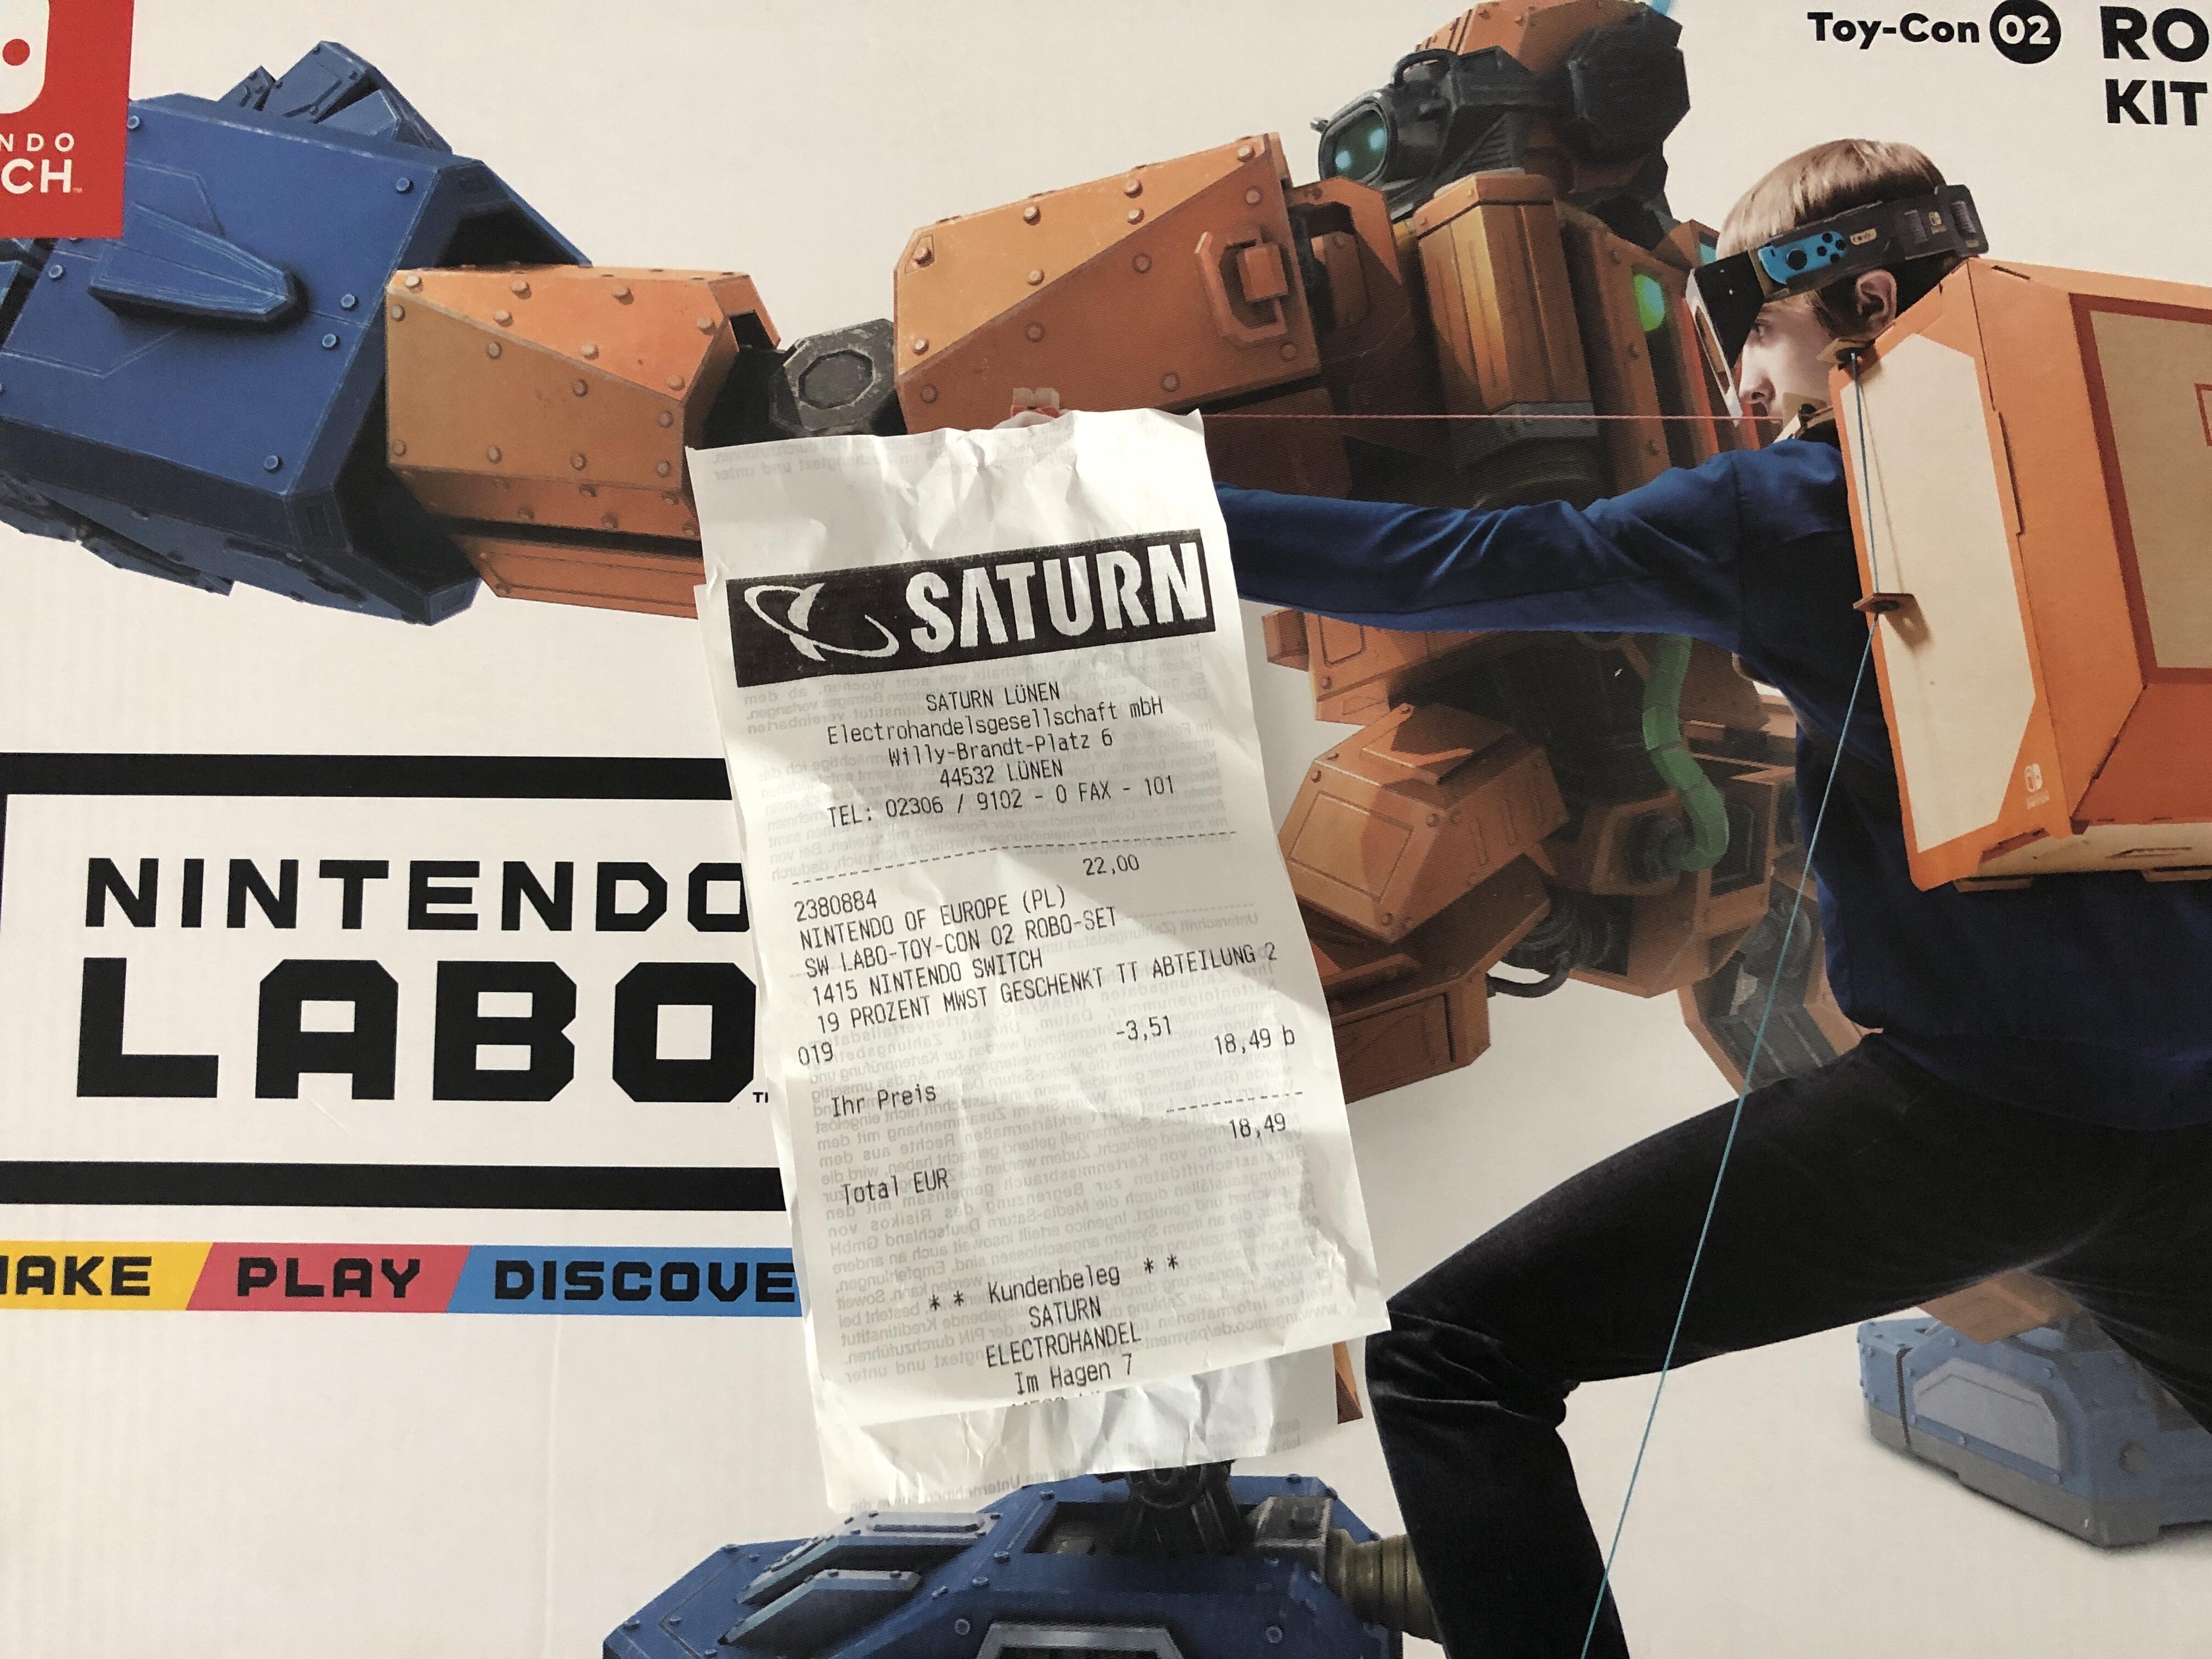 (Lokal Saturn Lünen) Nintendo Labo Toy Con 2 - Robot Kit